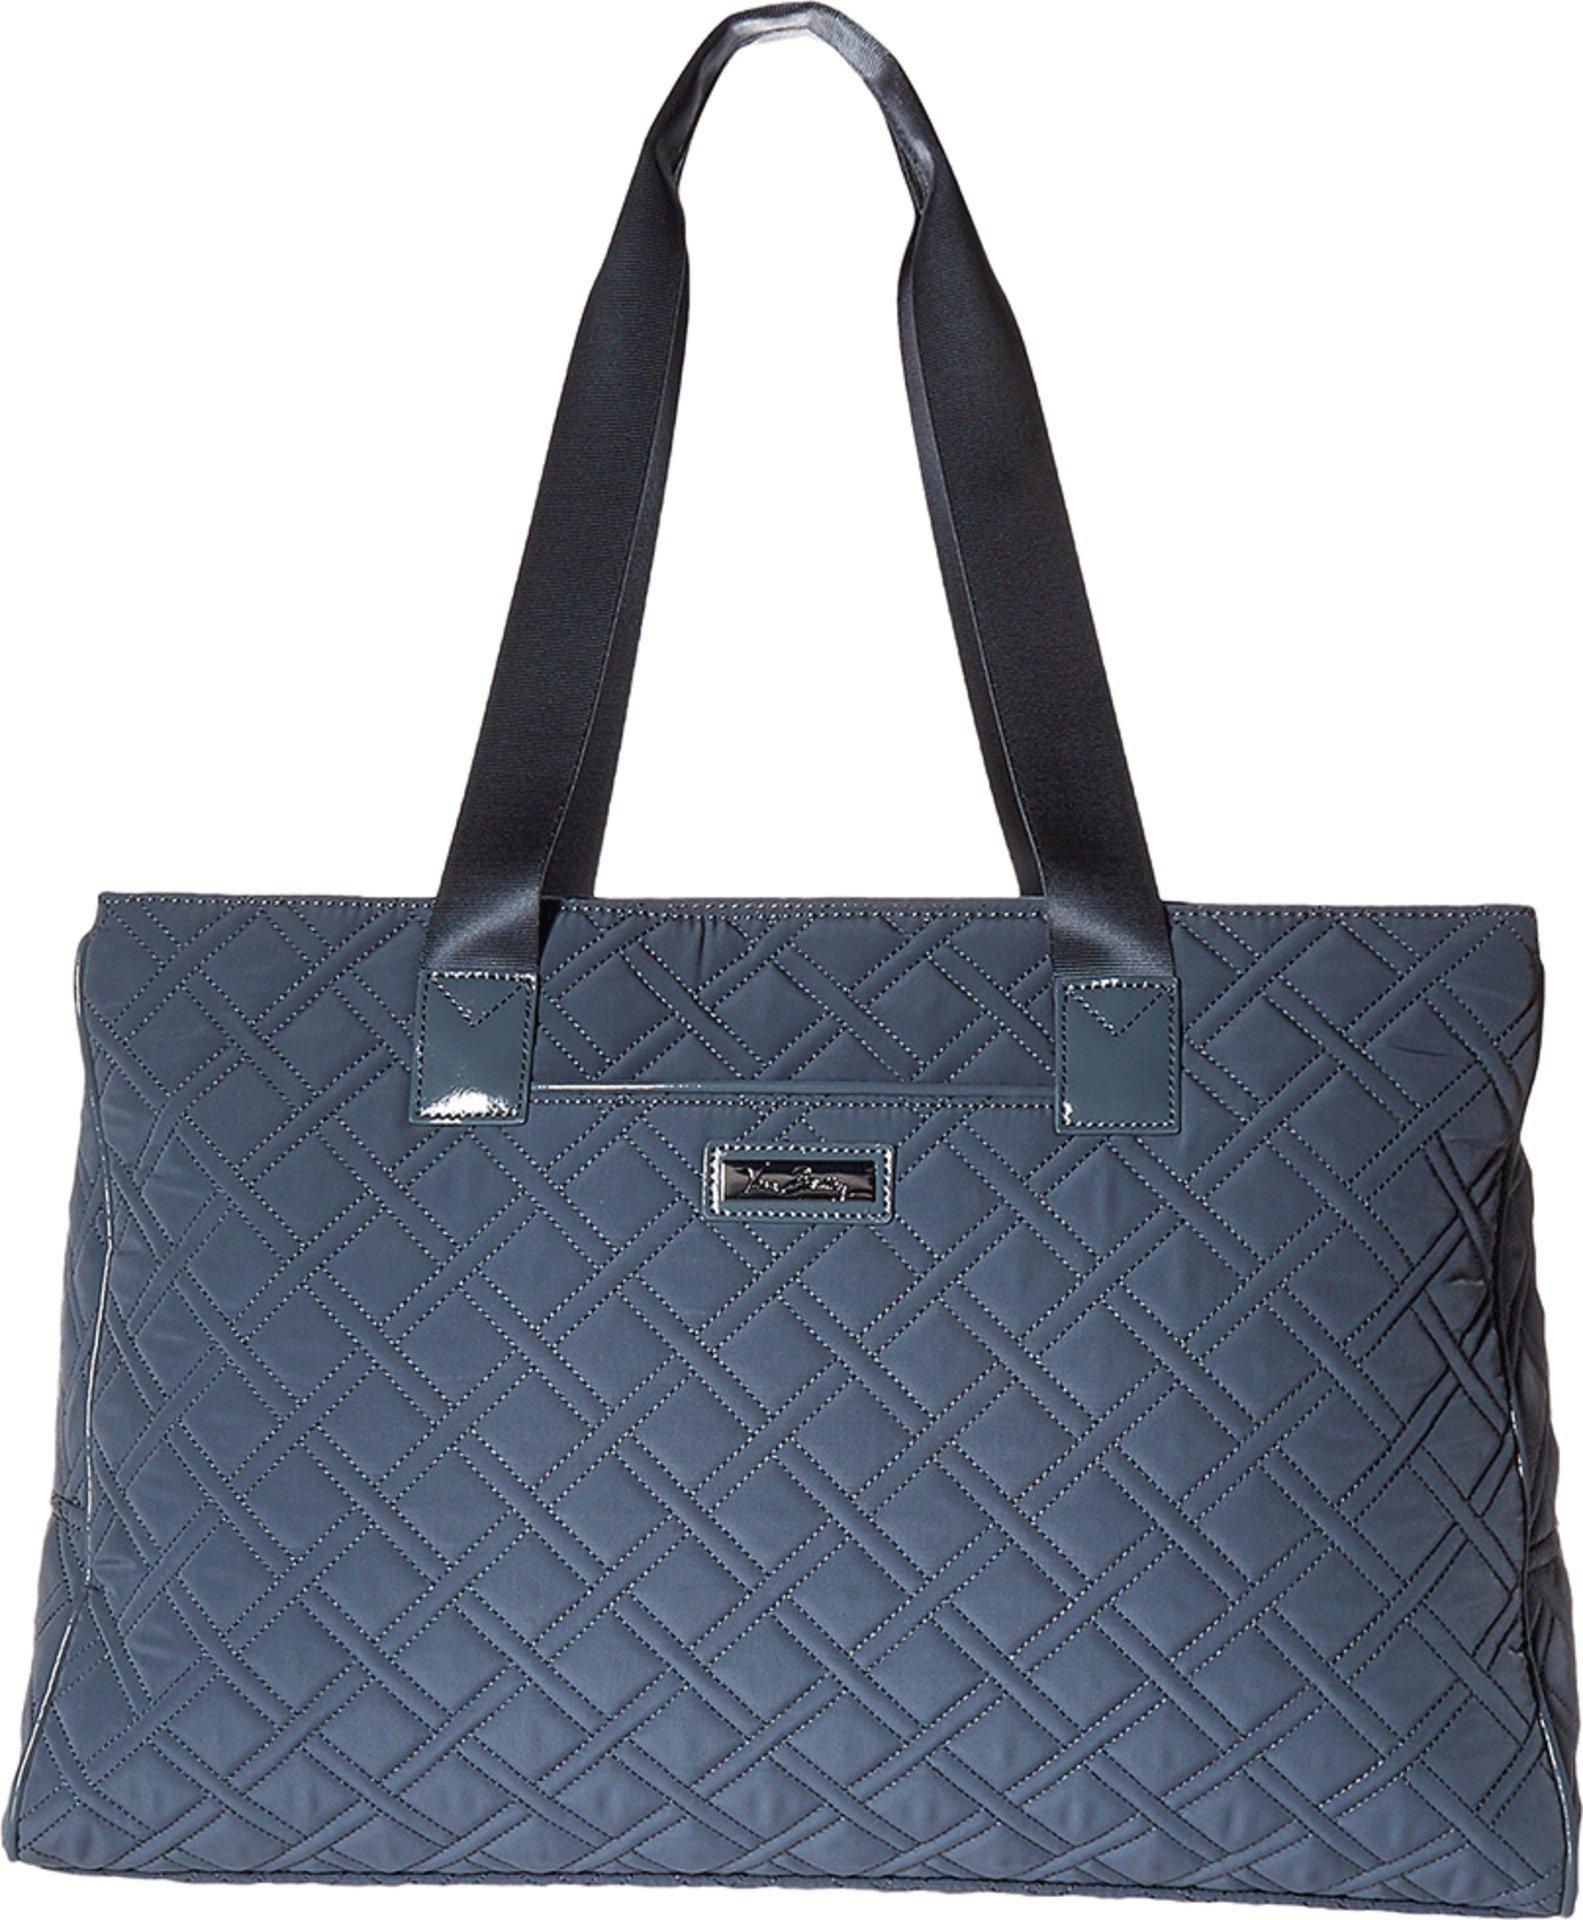 Vera Bradley Luggage Women's Triple Compartment Travel Bag Charcoal/Gray Travel Tote by Vera Bradley (Image #1)